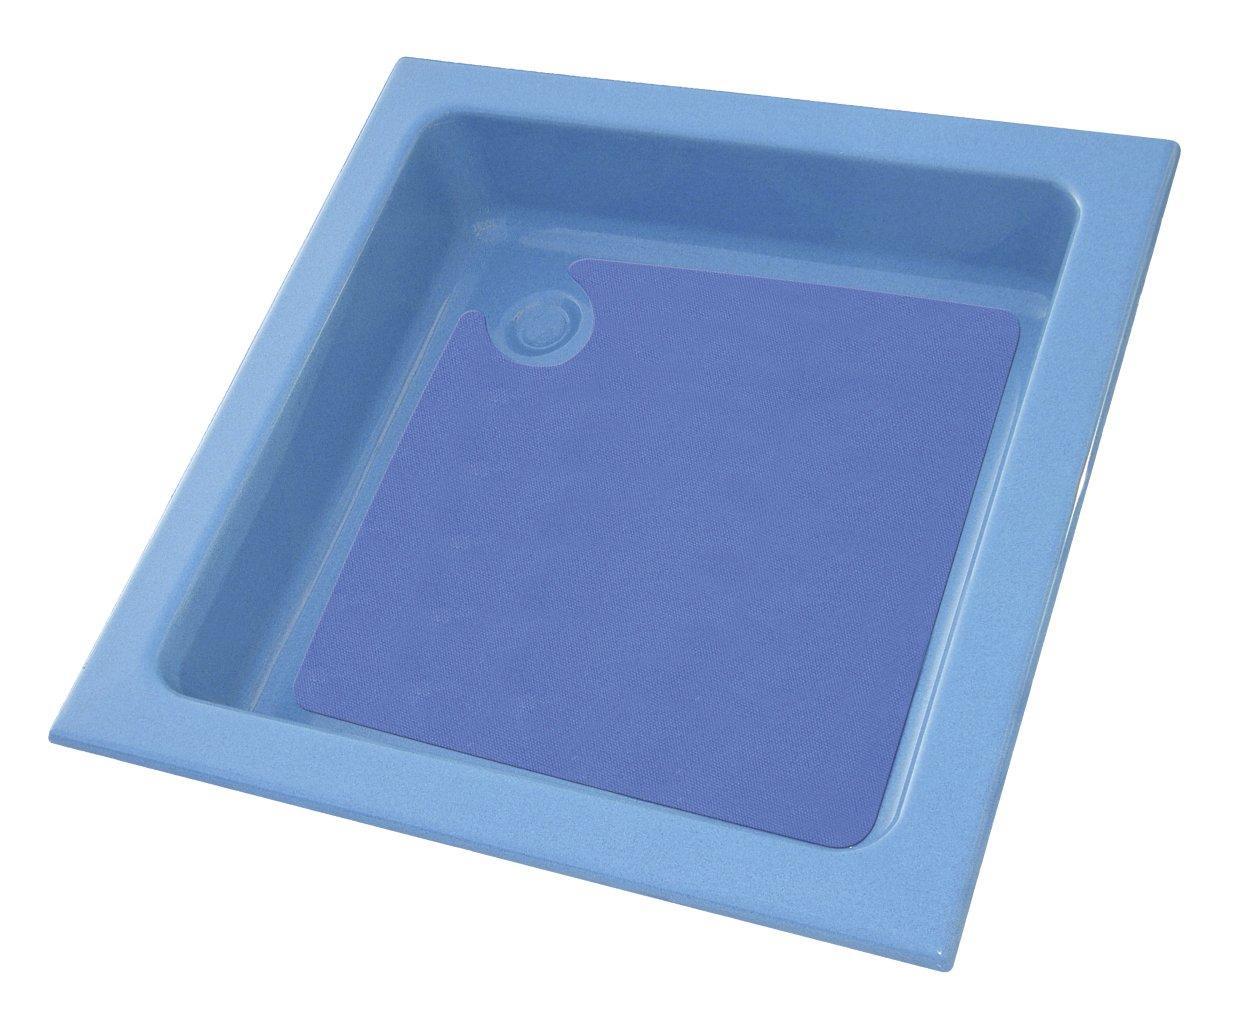 Vanička 90x90 cm, modrá/modrá